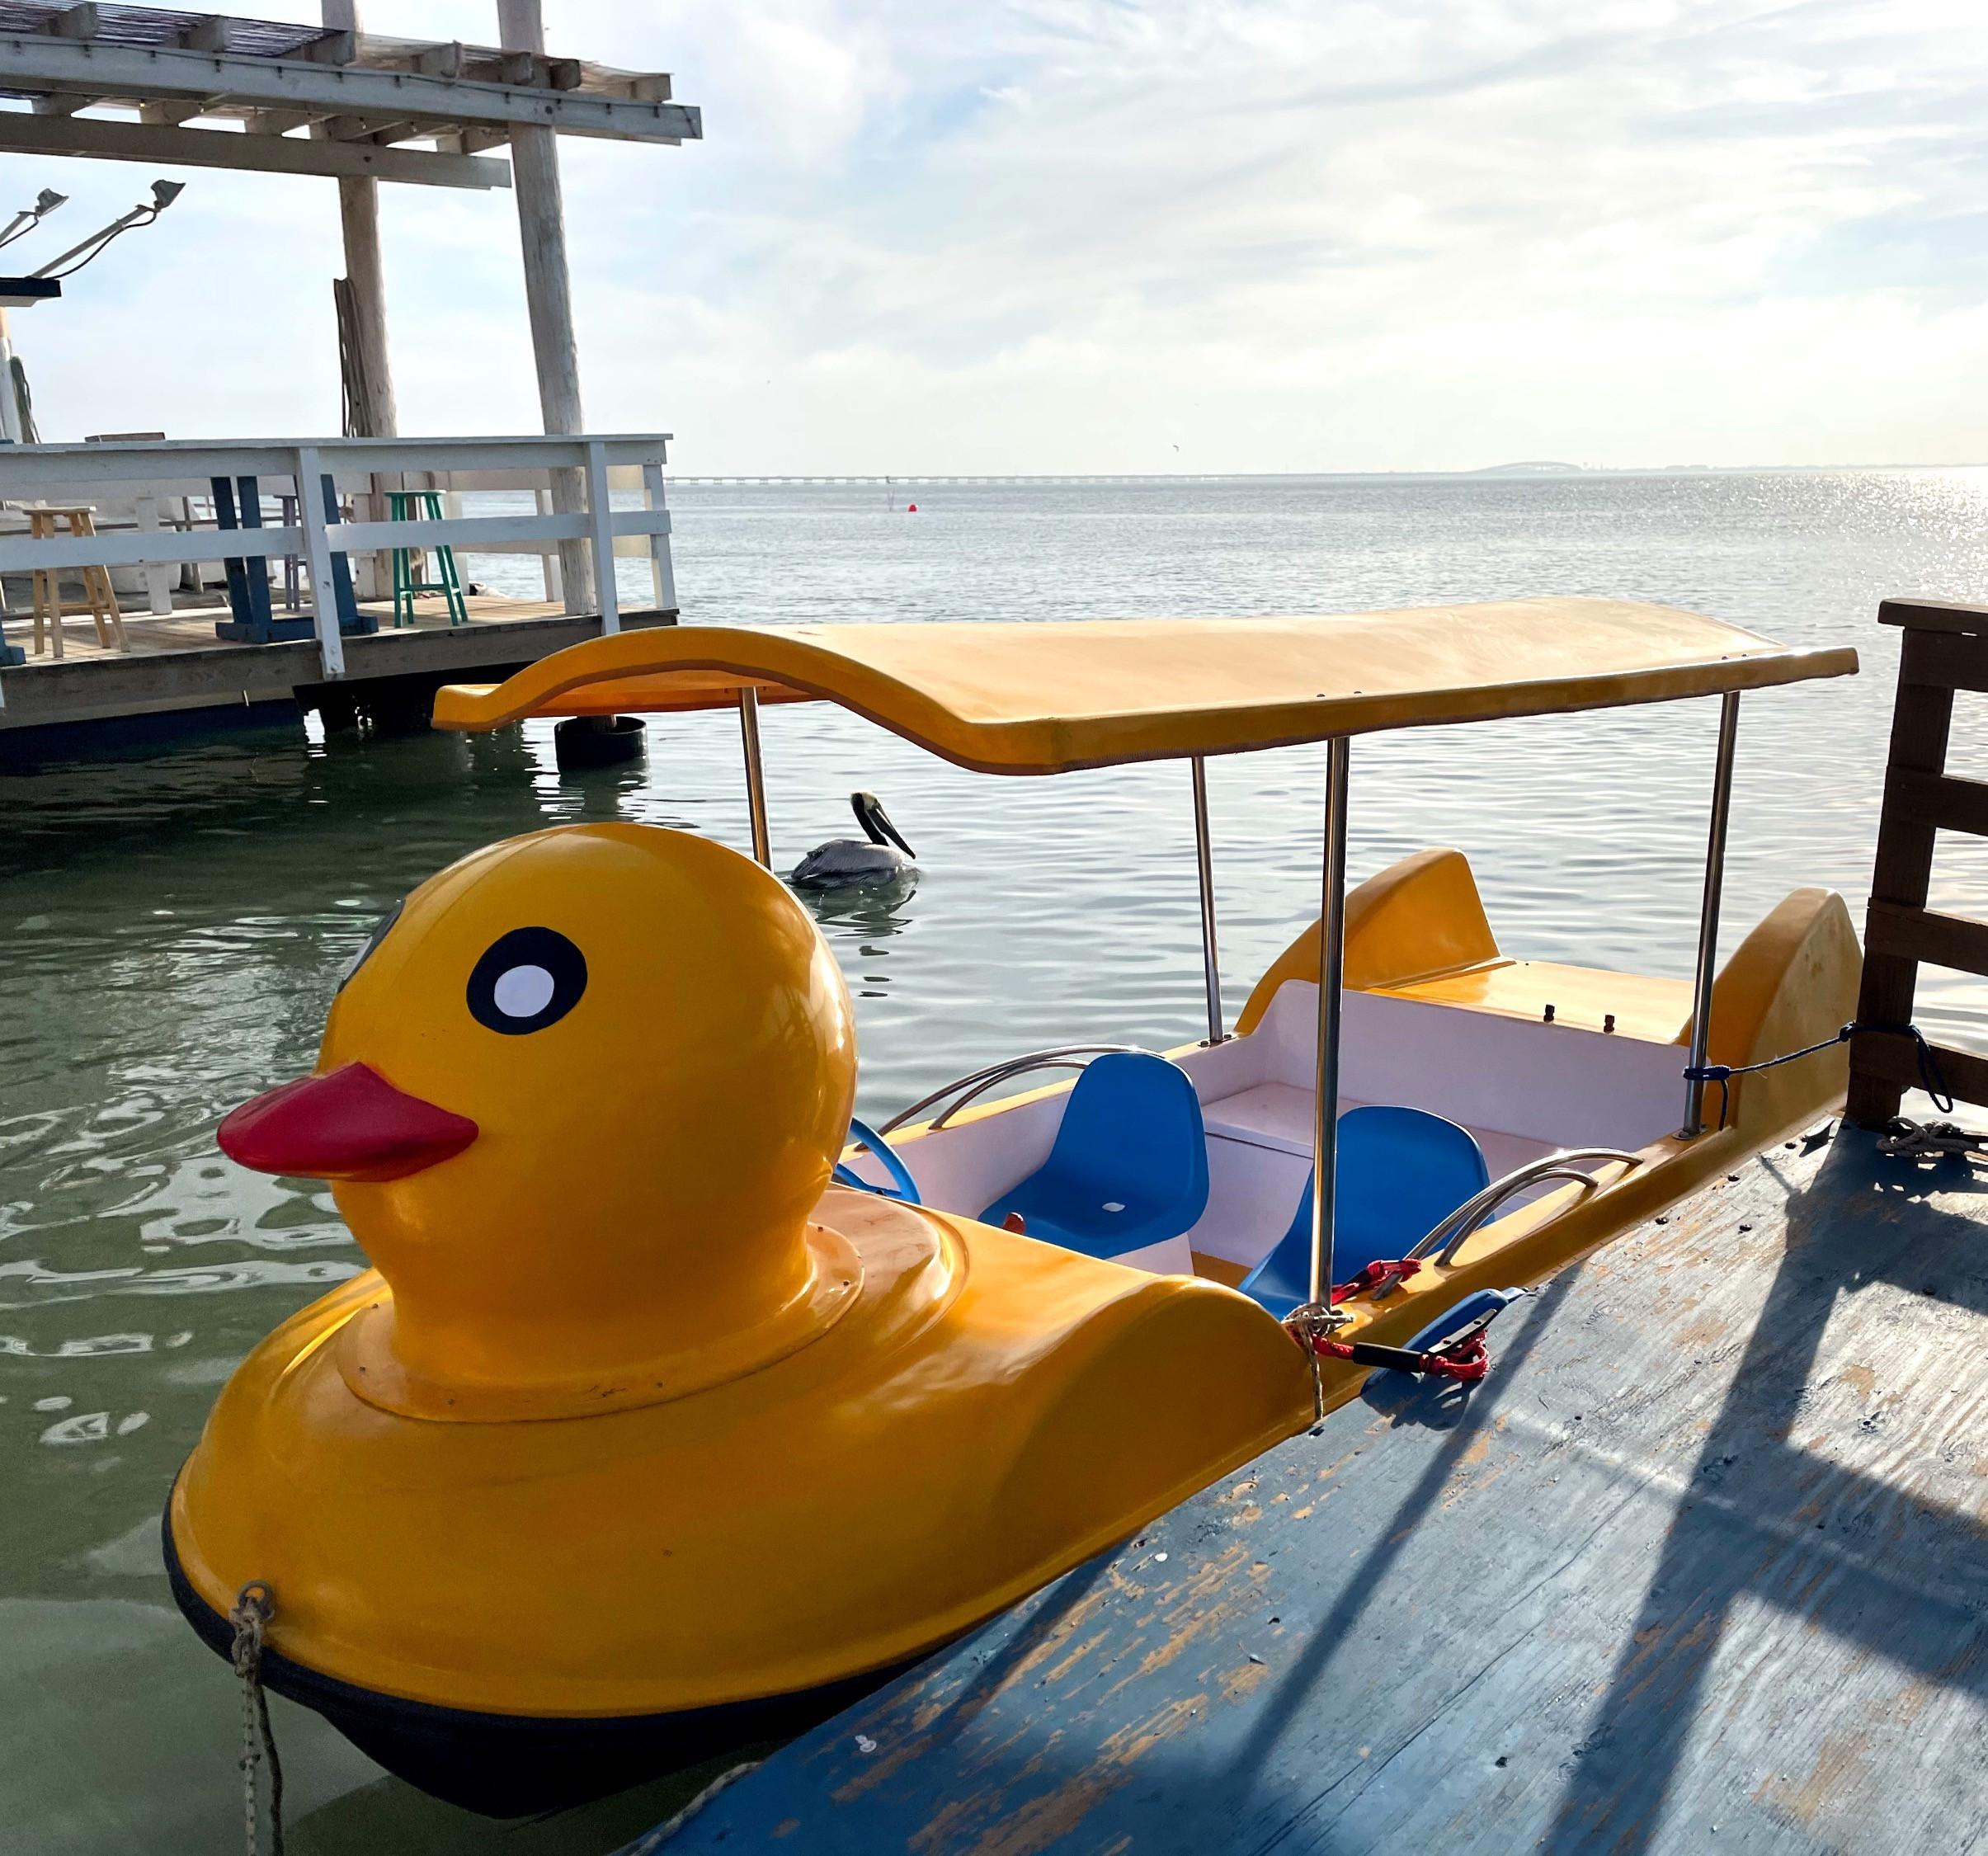 Duck Boat #2